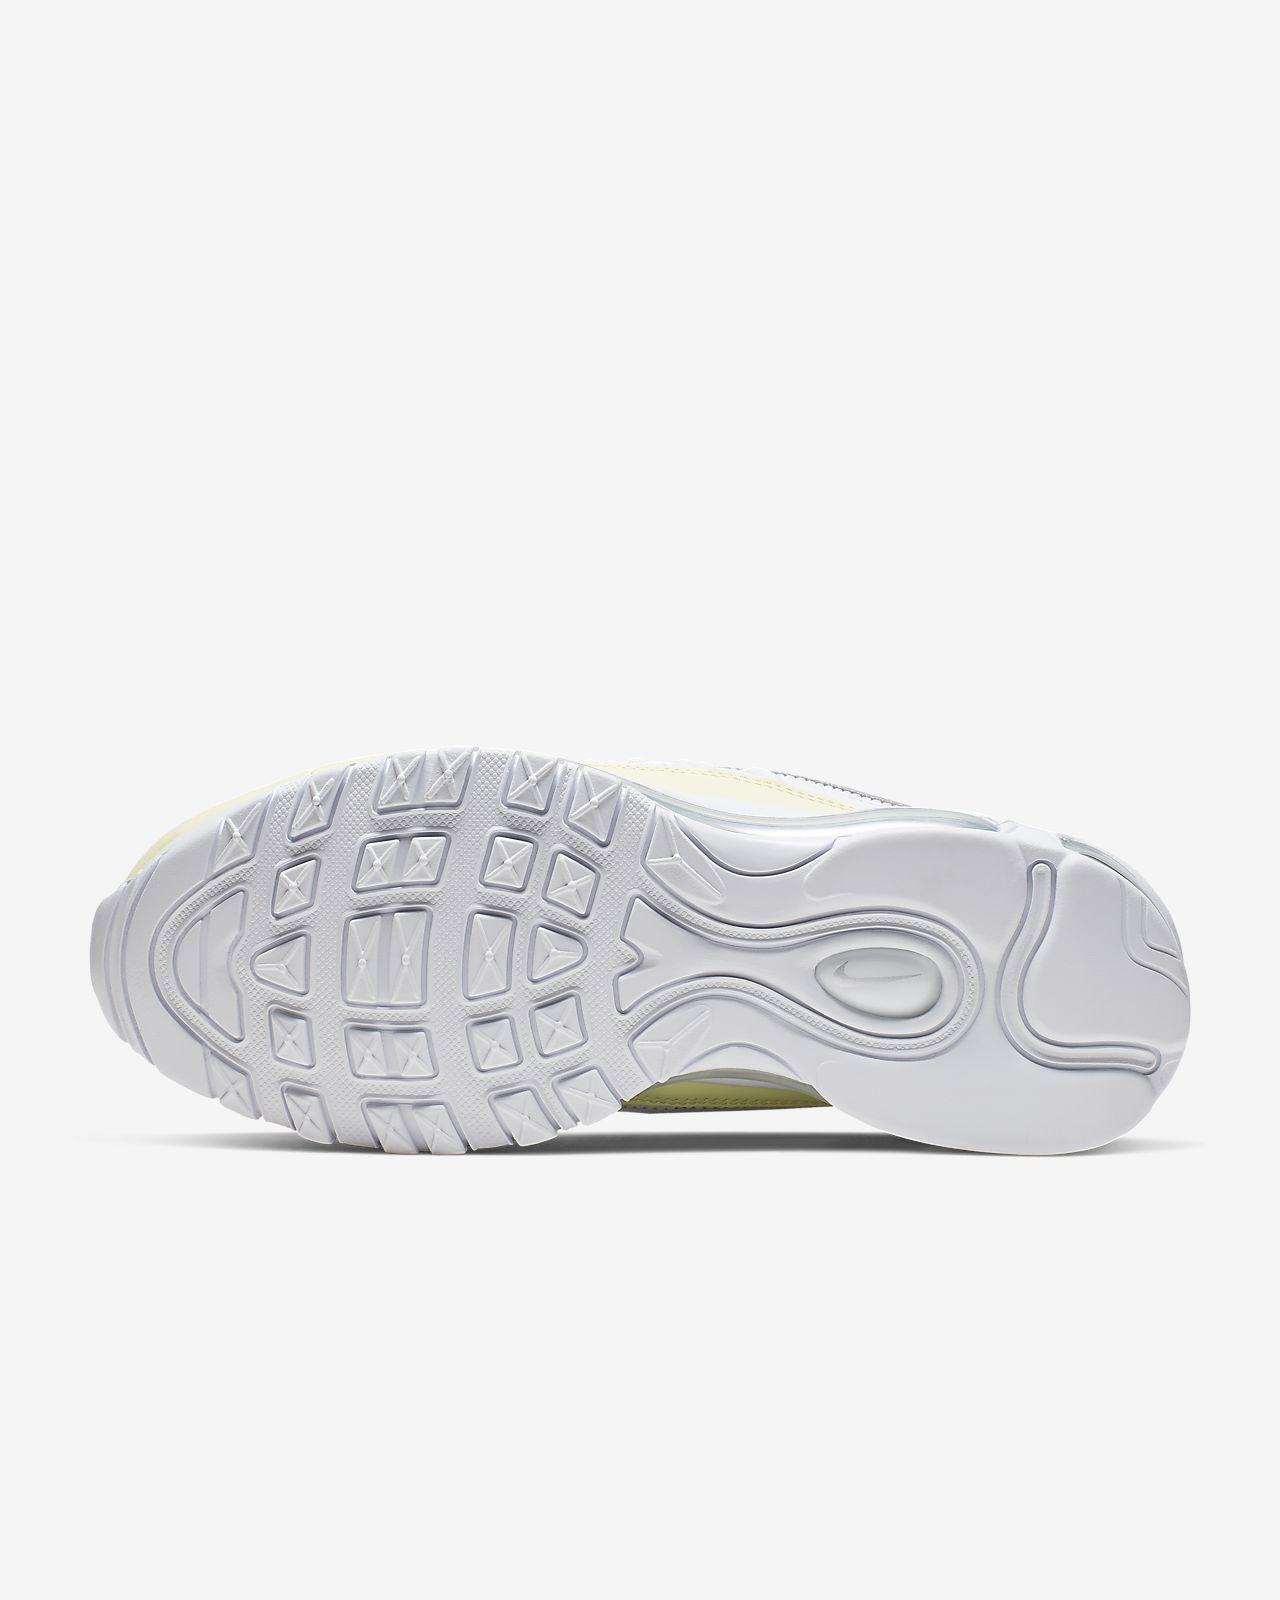 official photos 471e7 7a1df Nike Air Max 98 Women's Shoe